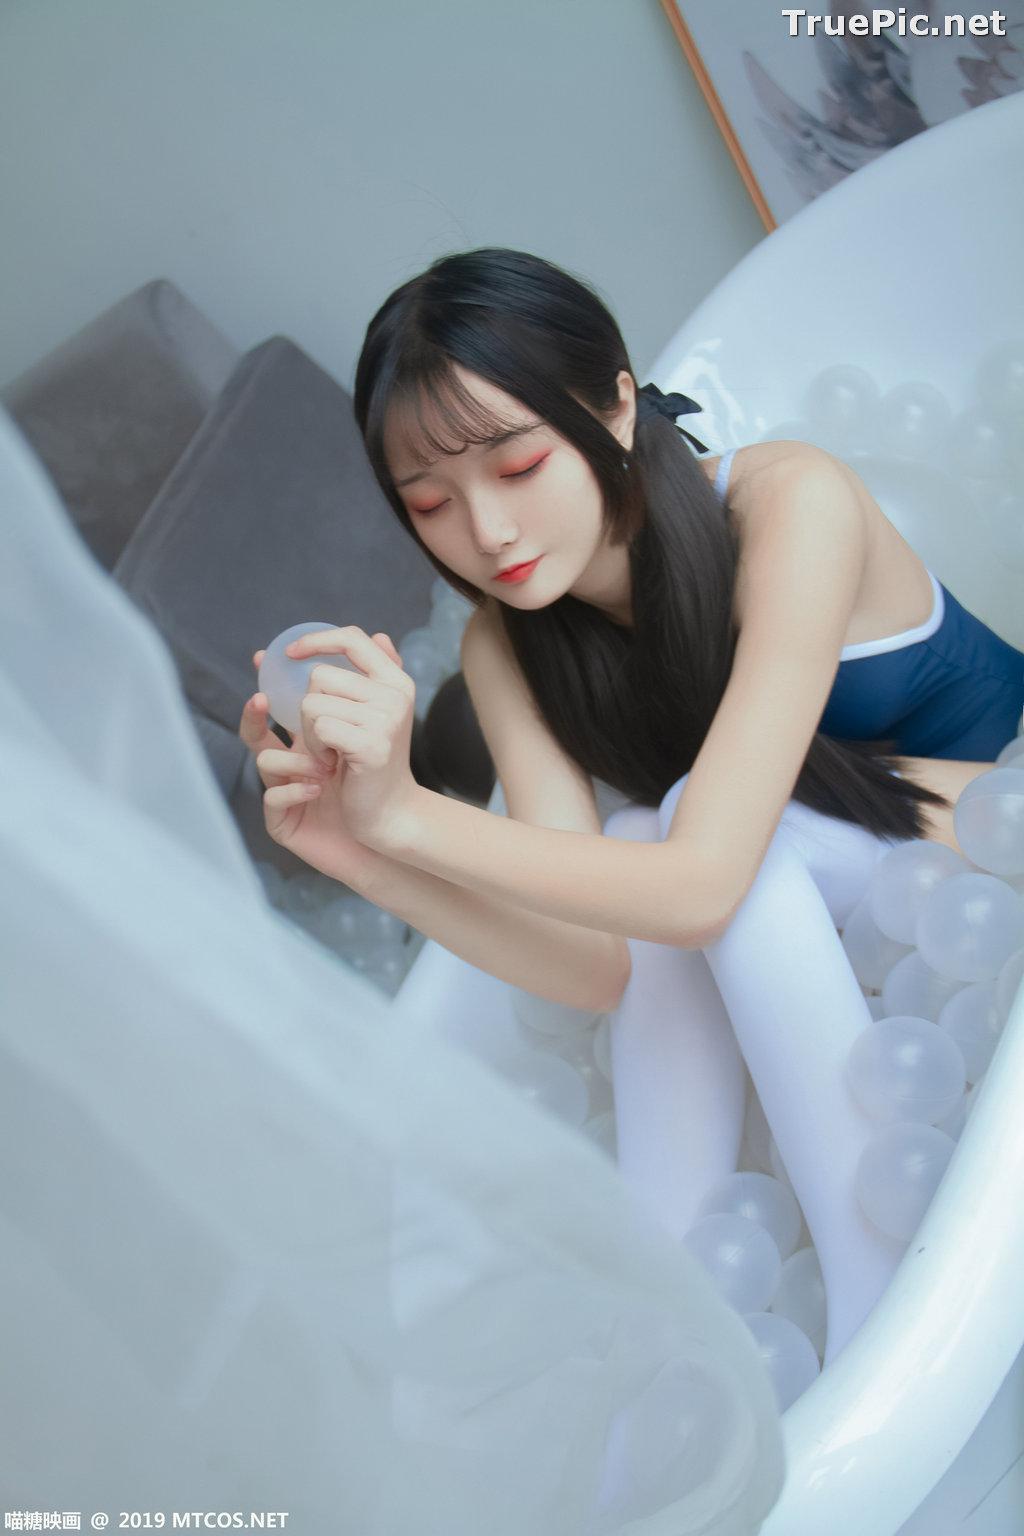 Image [MTCos] 喵糖映画 Vol.046 – Chinese Cute Model – Blue Monokini In Bathtub - TruePic.net - Picture-8